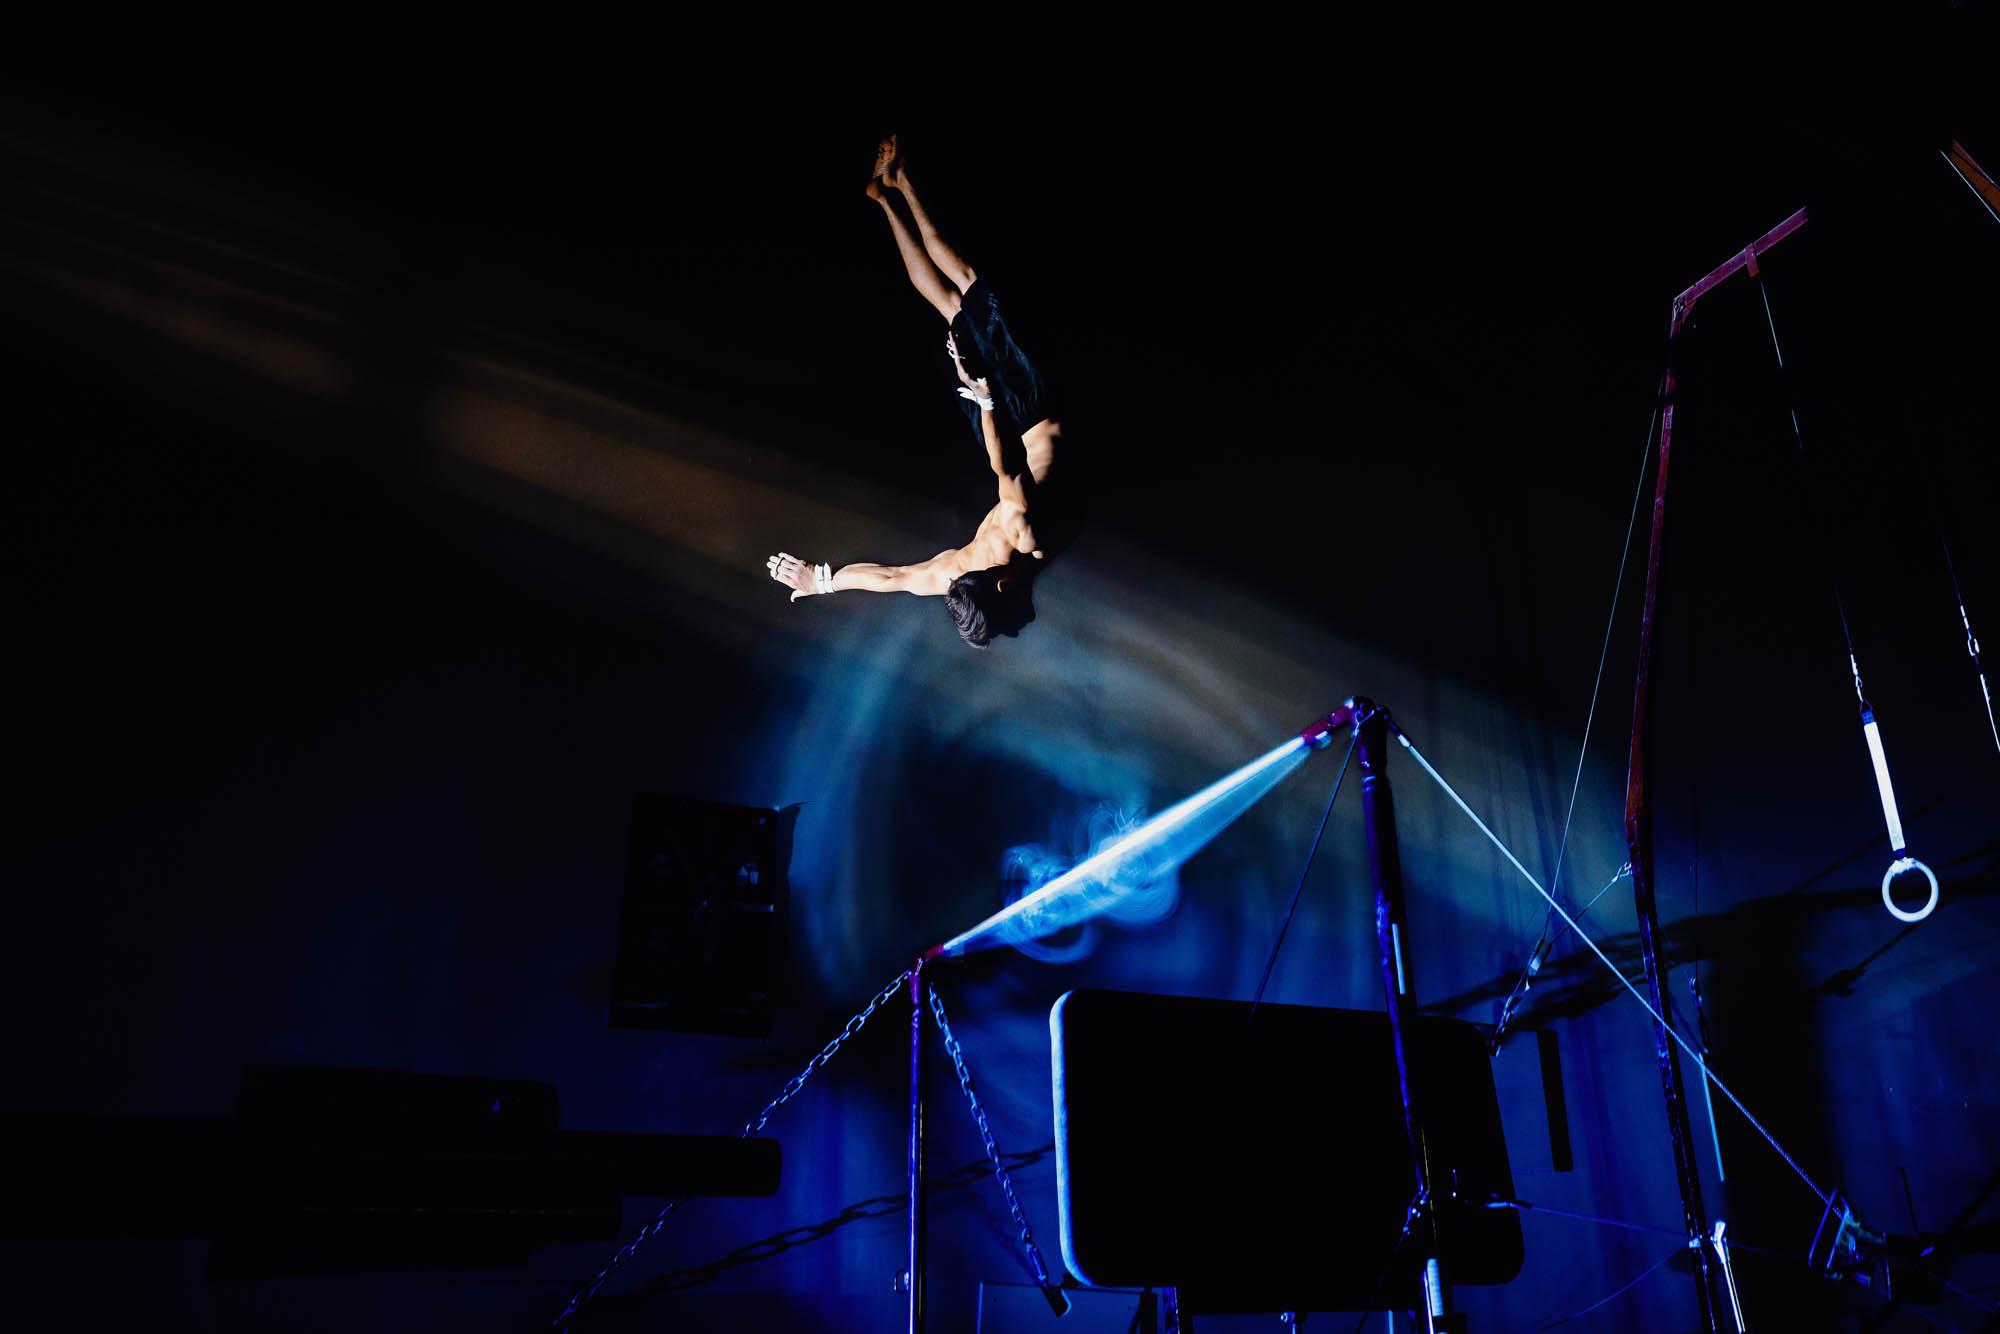 Lex & Josh Devy & Michelle Editorial Shoot Gymnastics Dance Light Trail Athlete-10.jpg